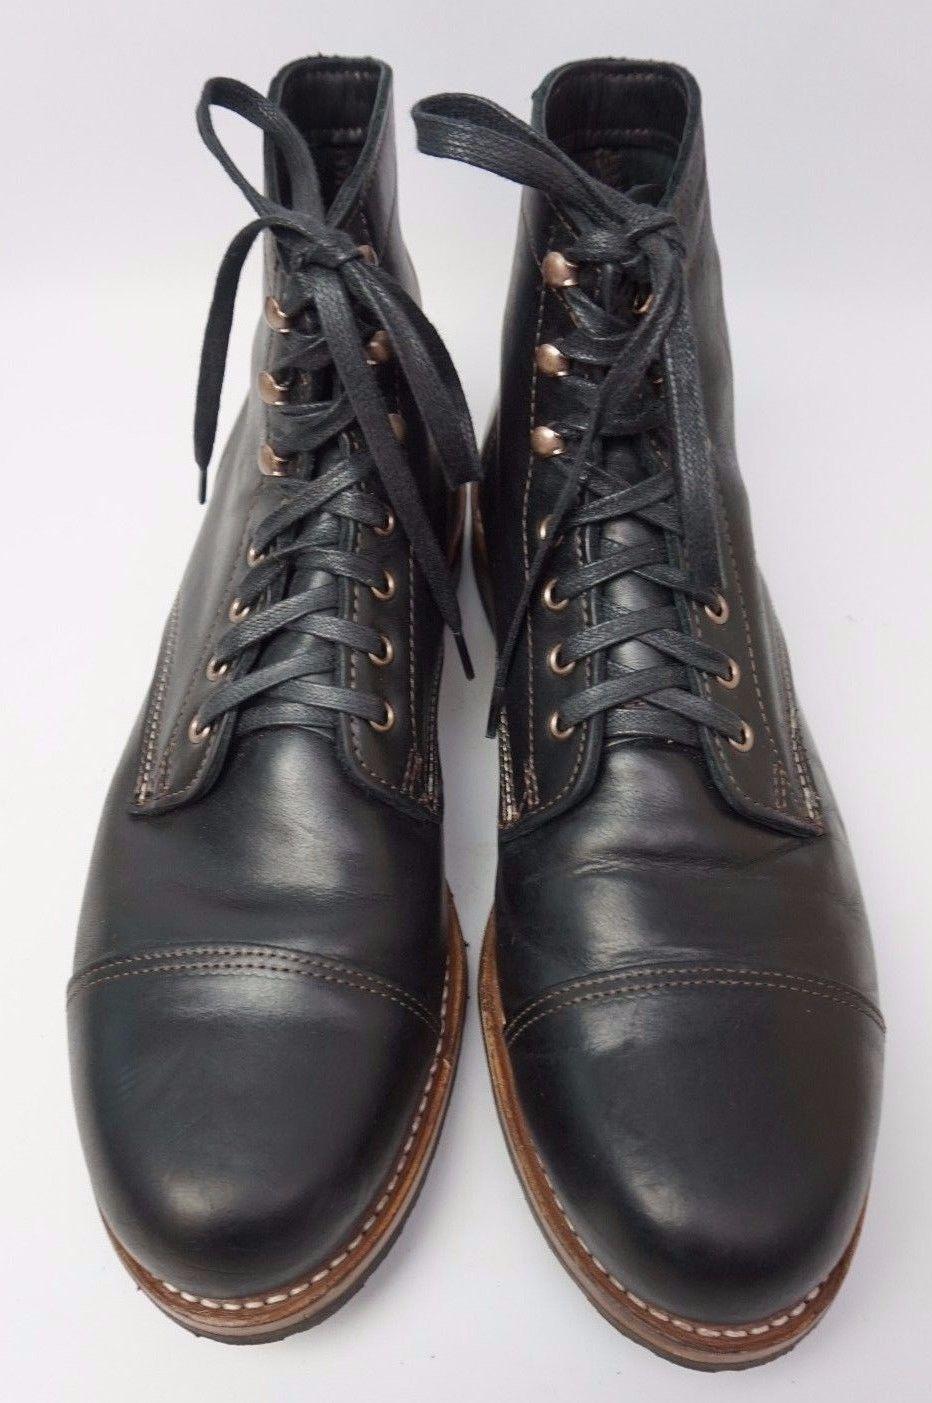 0679fe87760 Wolverine 1000 Mile Adrian Cap Toe Black Leather Men s Boot Size 13 ...